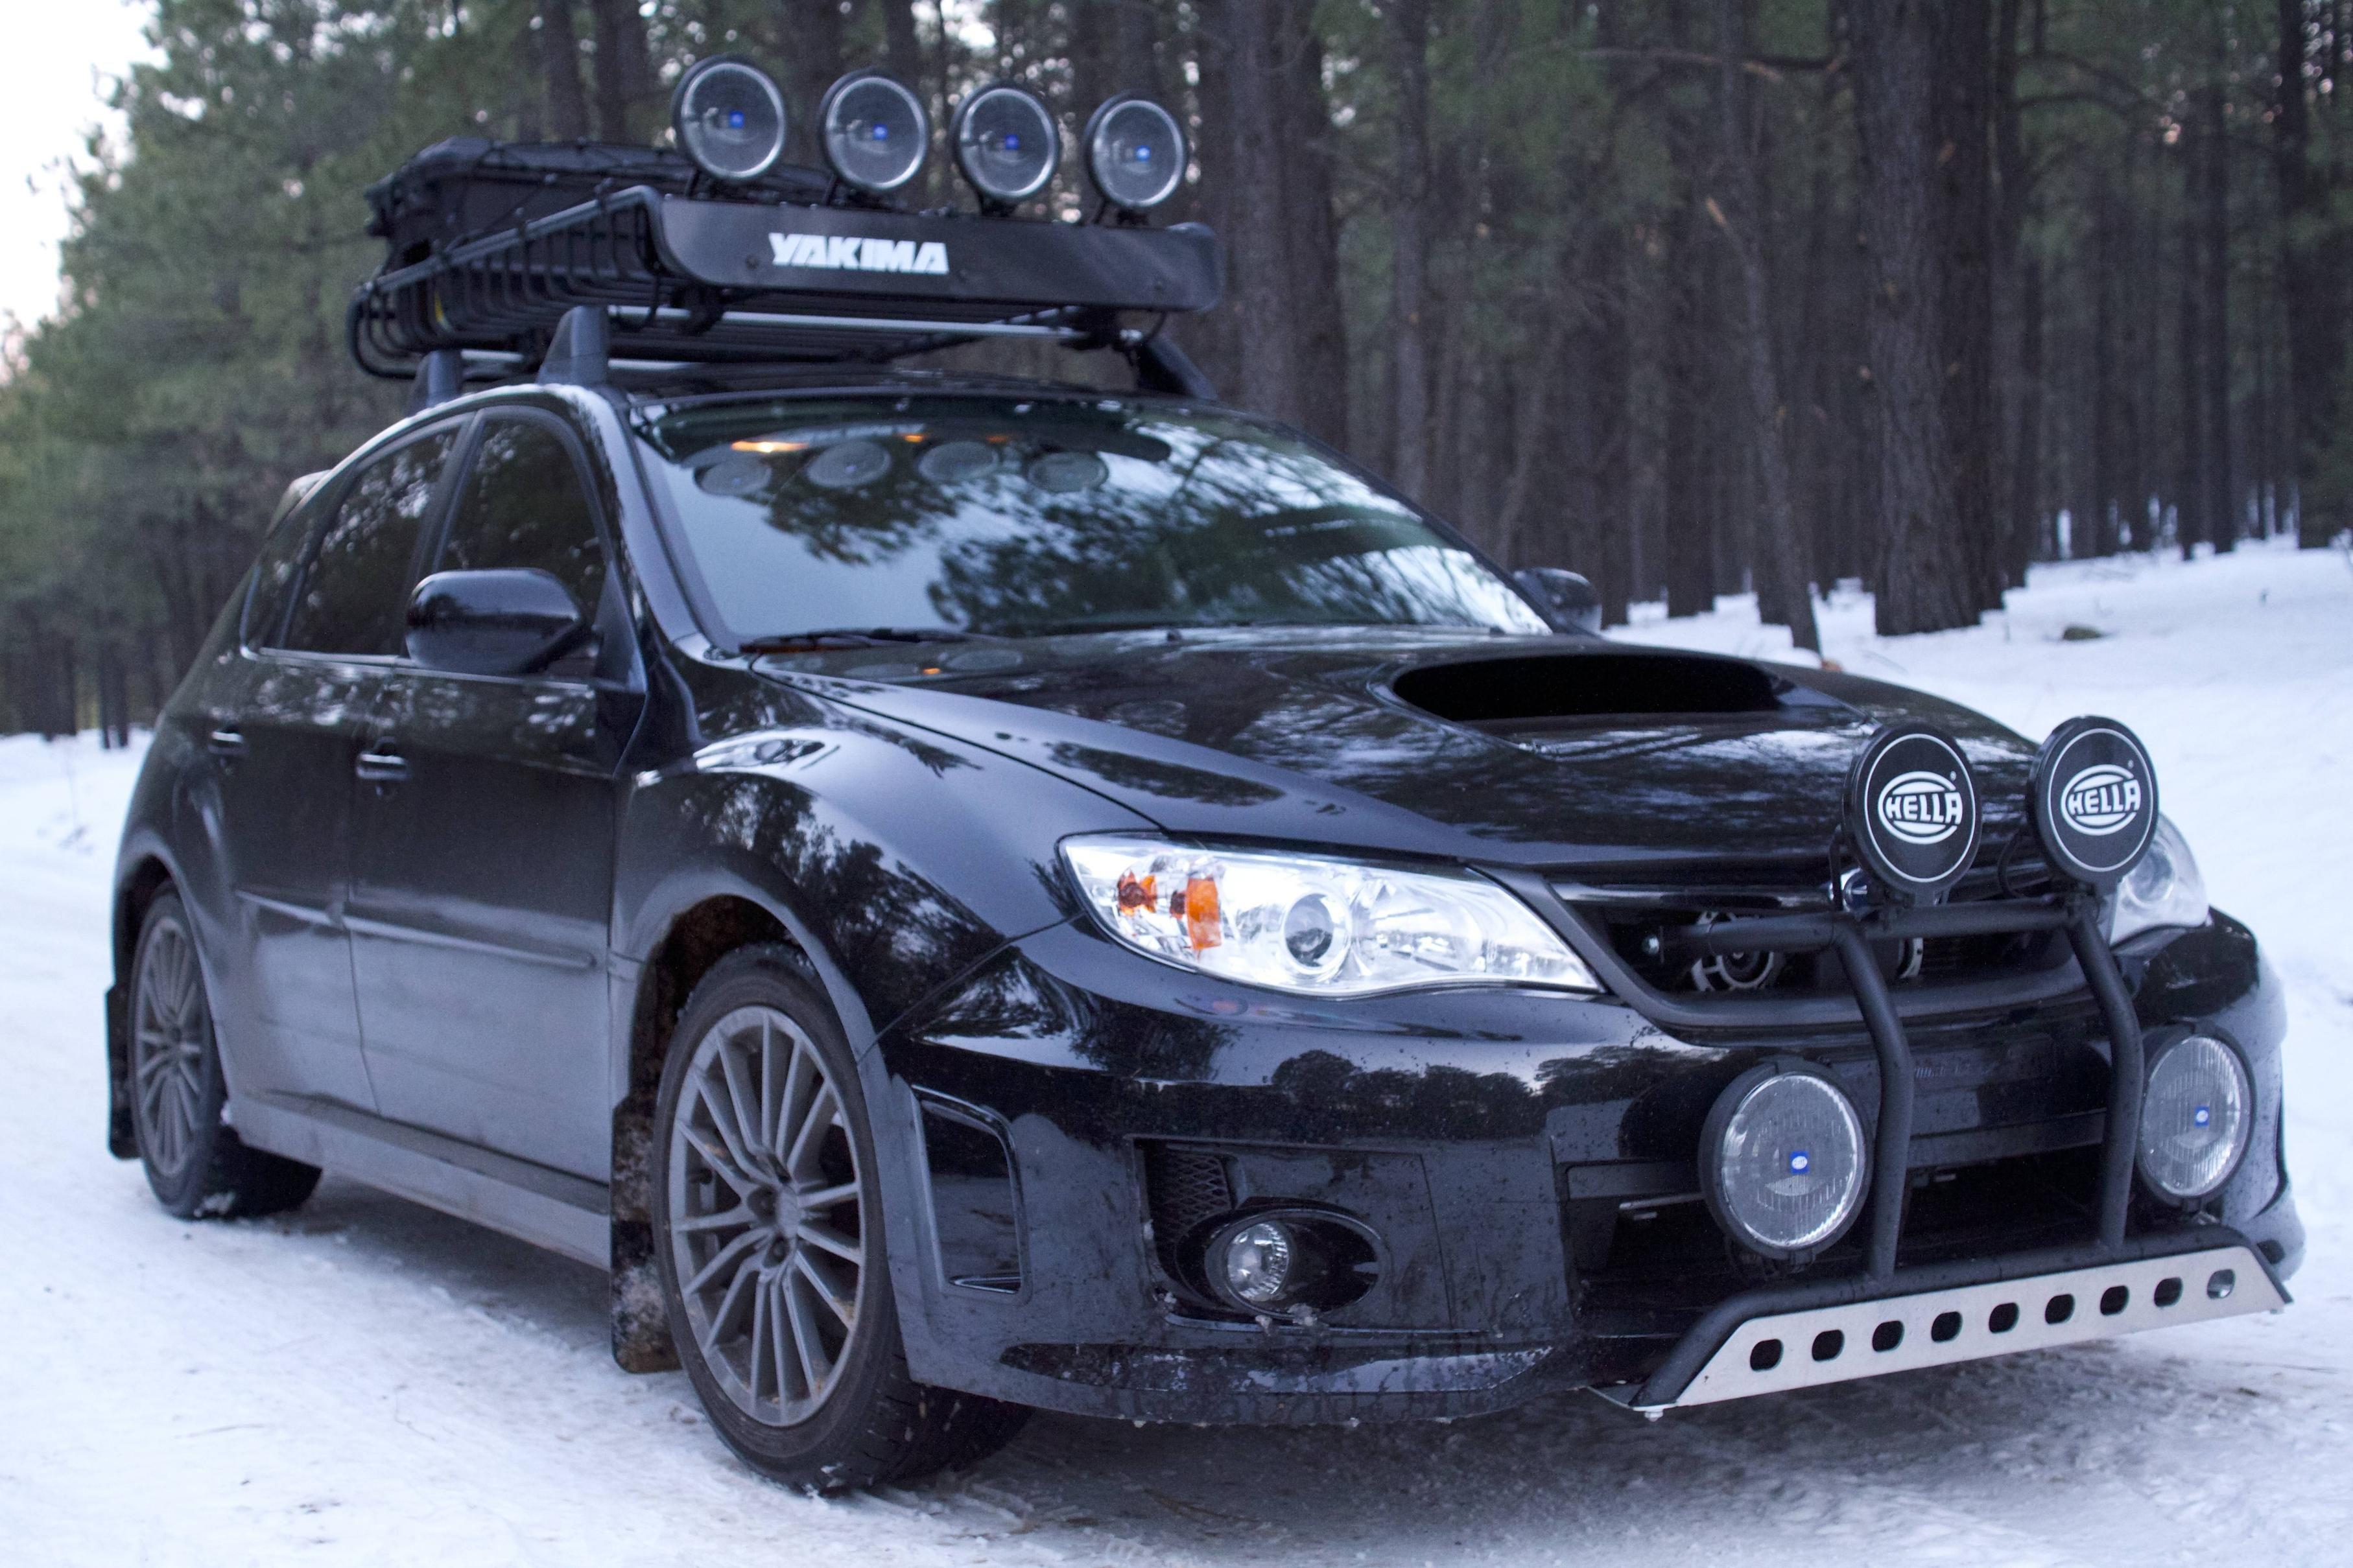 Snowy Subie Imgur Subaru Hatchback Subaru Impreza Sport Subaru Outback